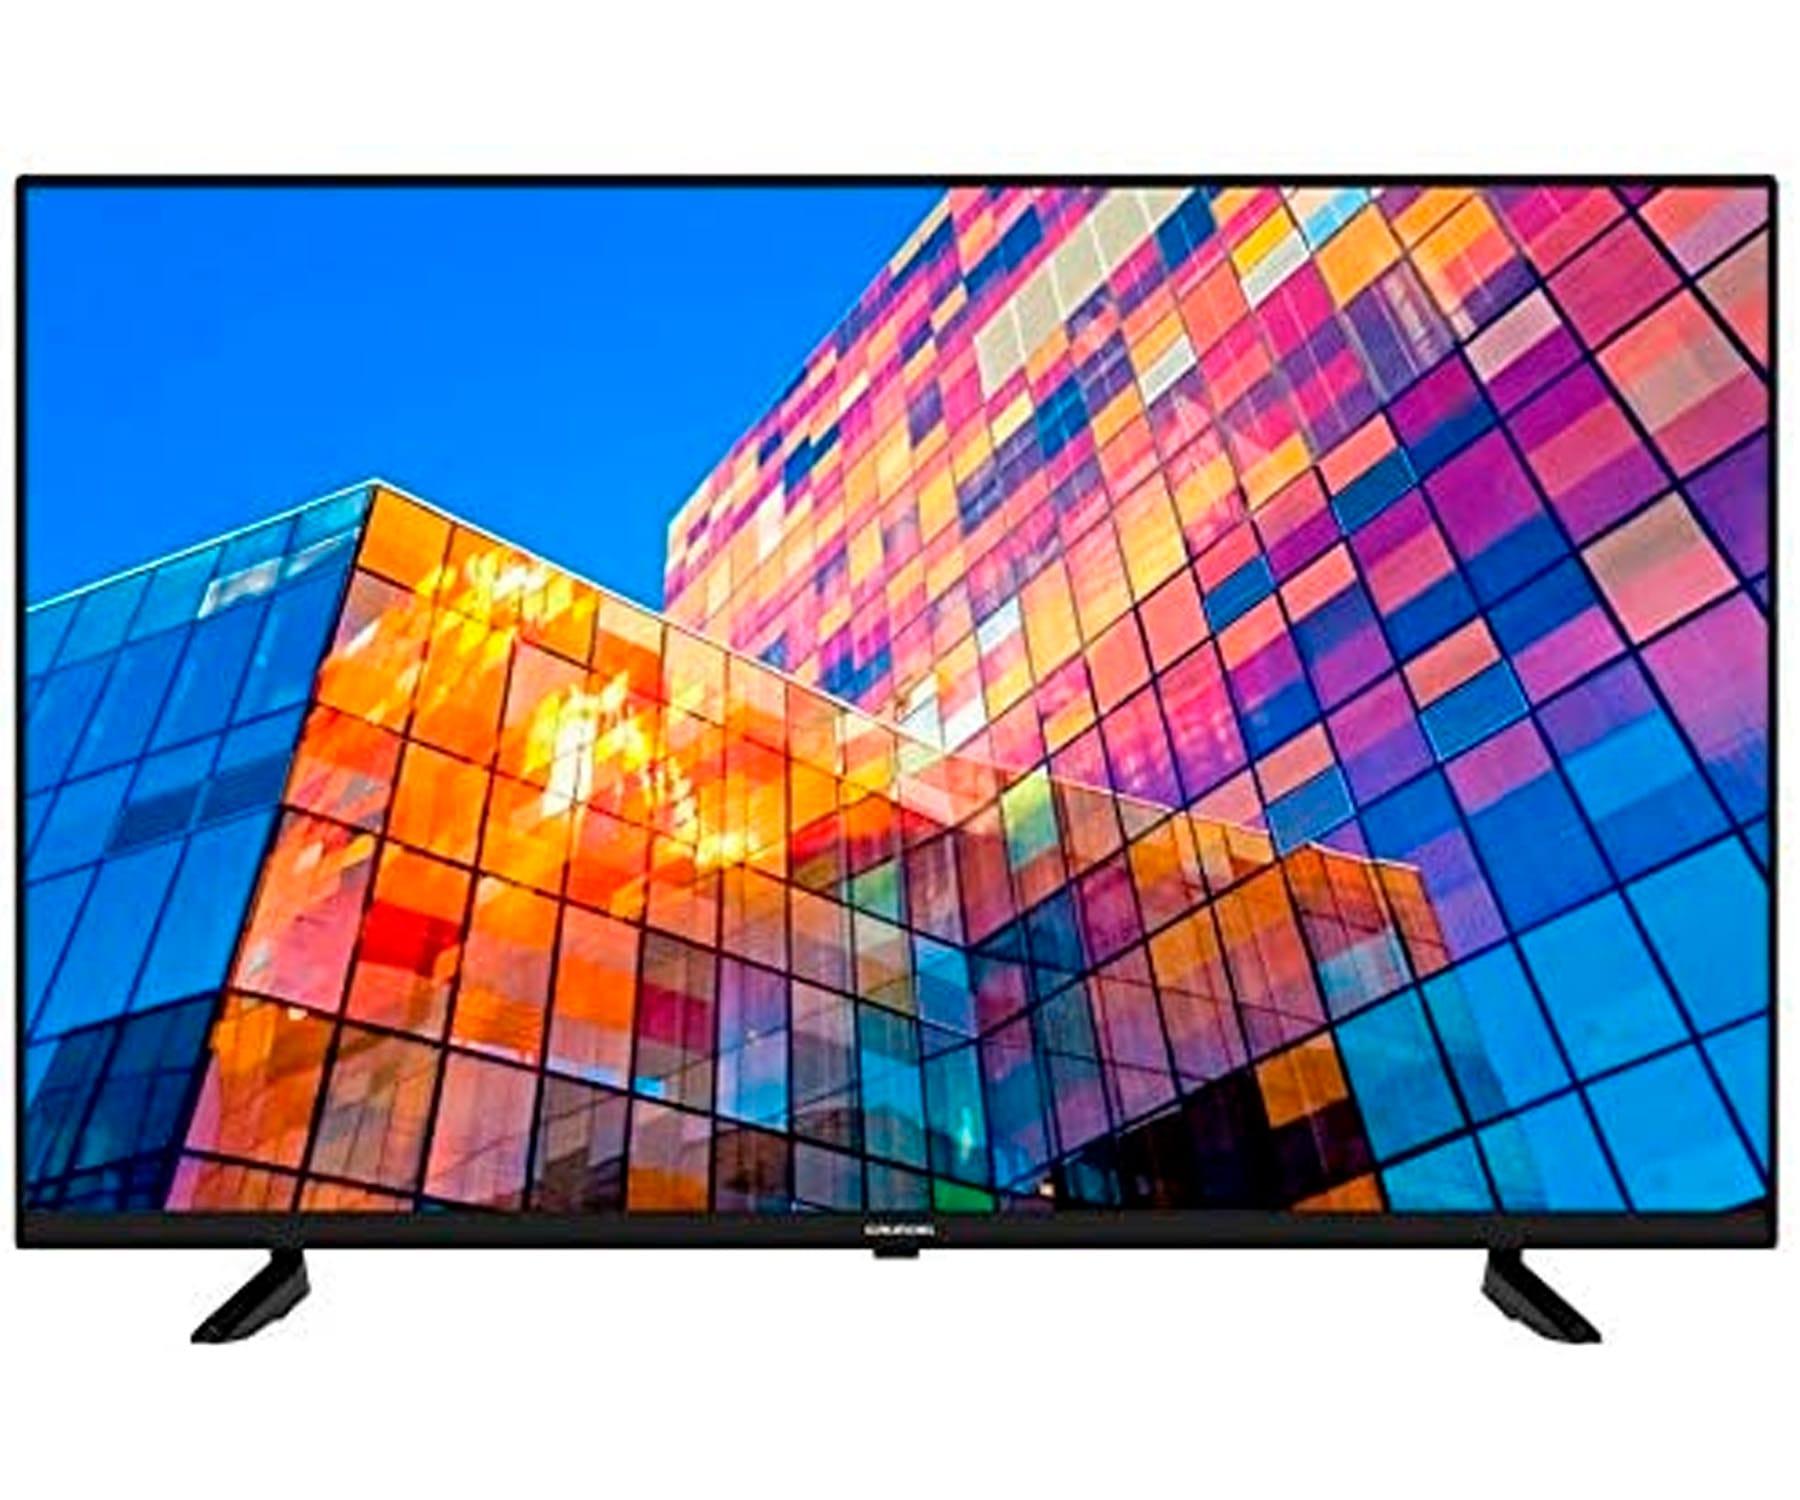 GRUNDIG 43GEU7800B TELEVISOR 43'' 4K 1100VPI SMART TV HDMI WIFI ETHERNET USB CI+ PVR